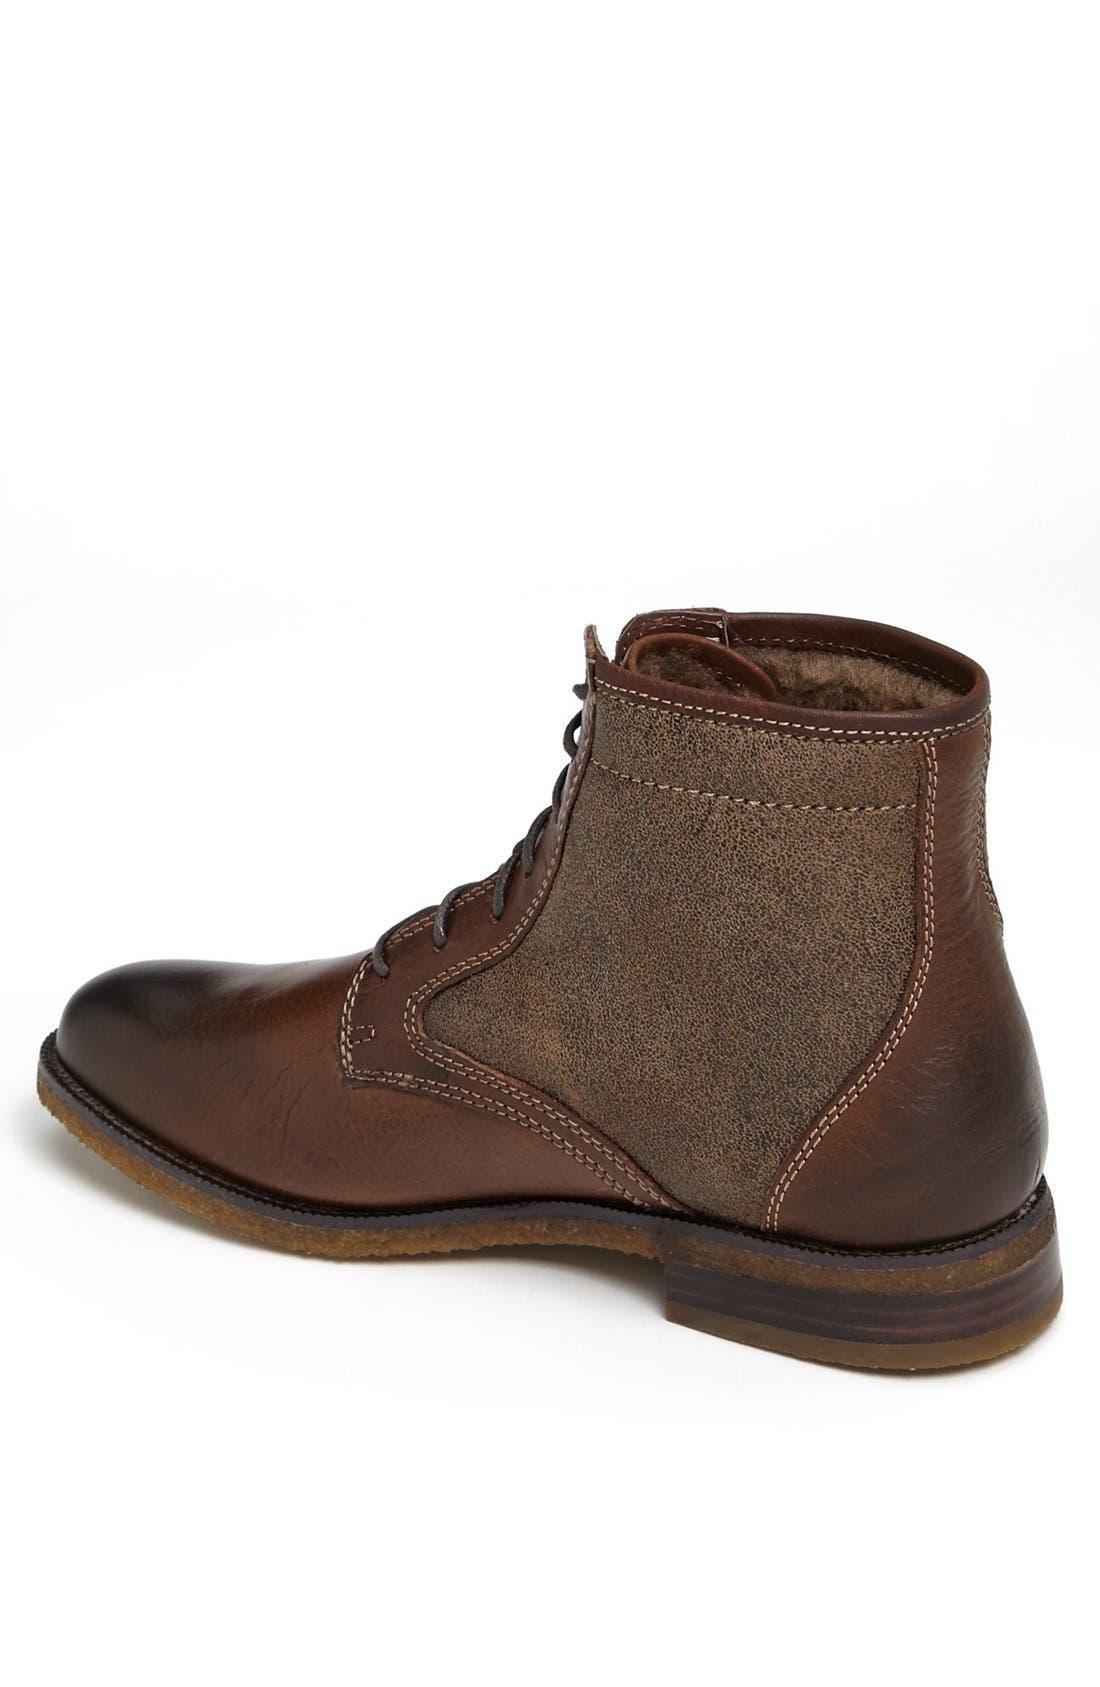 Alternate Image 2  - J&M 1850 'Burchfield' Boot (Online Only)